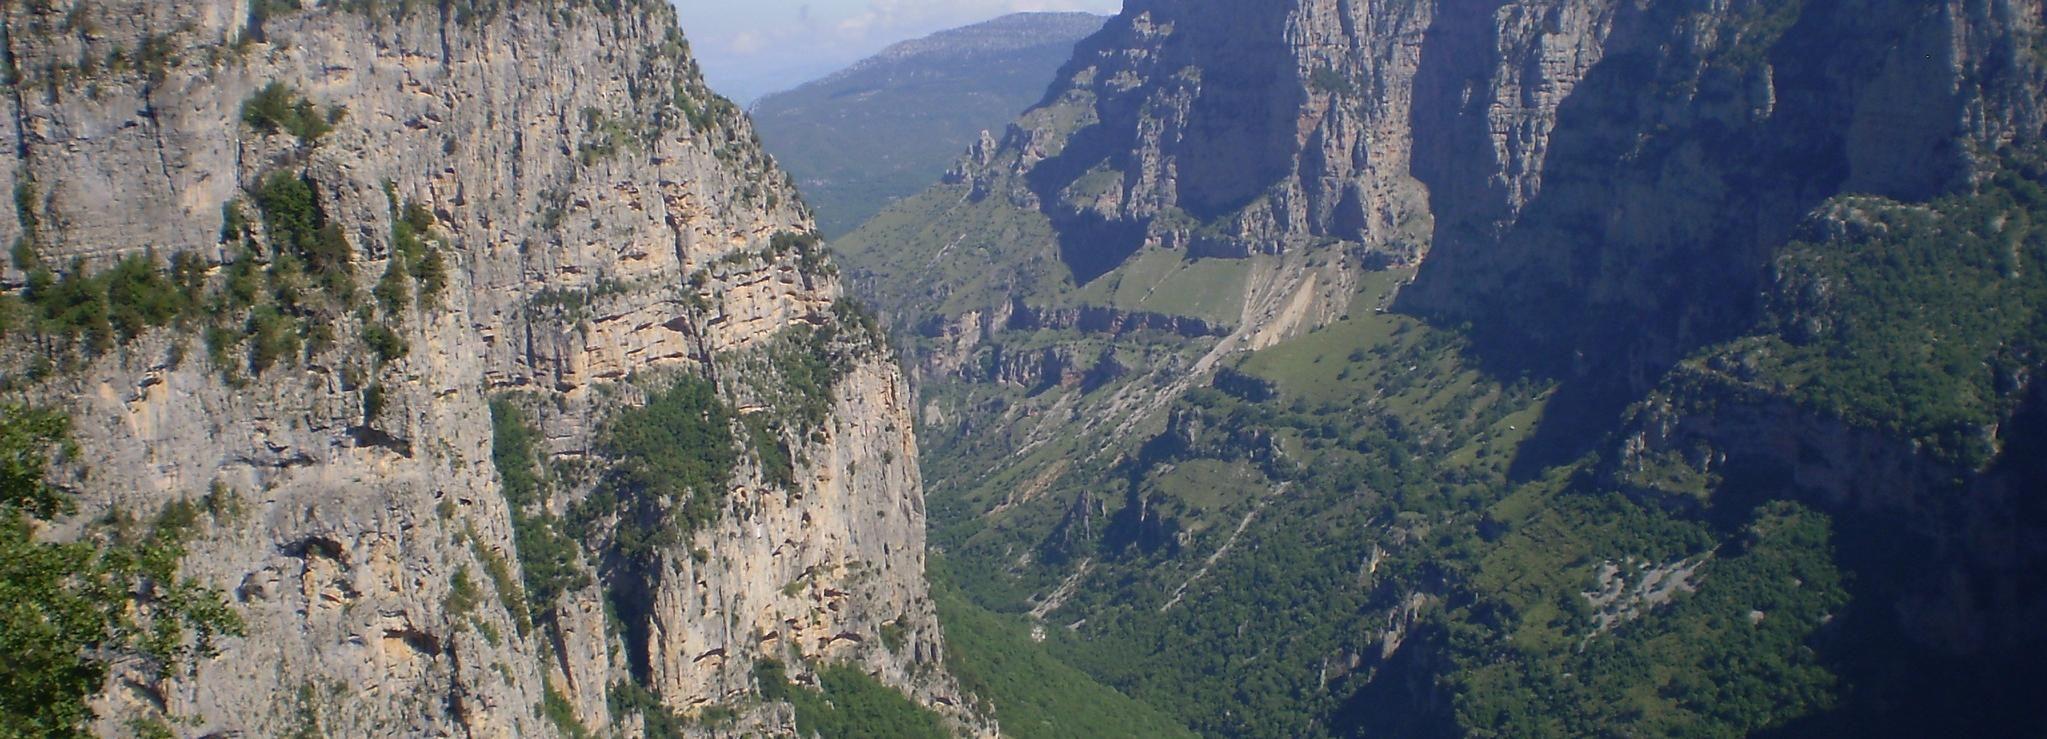 Vikos Gorge Beloi Viewpoint 3-Hour Hike